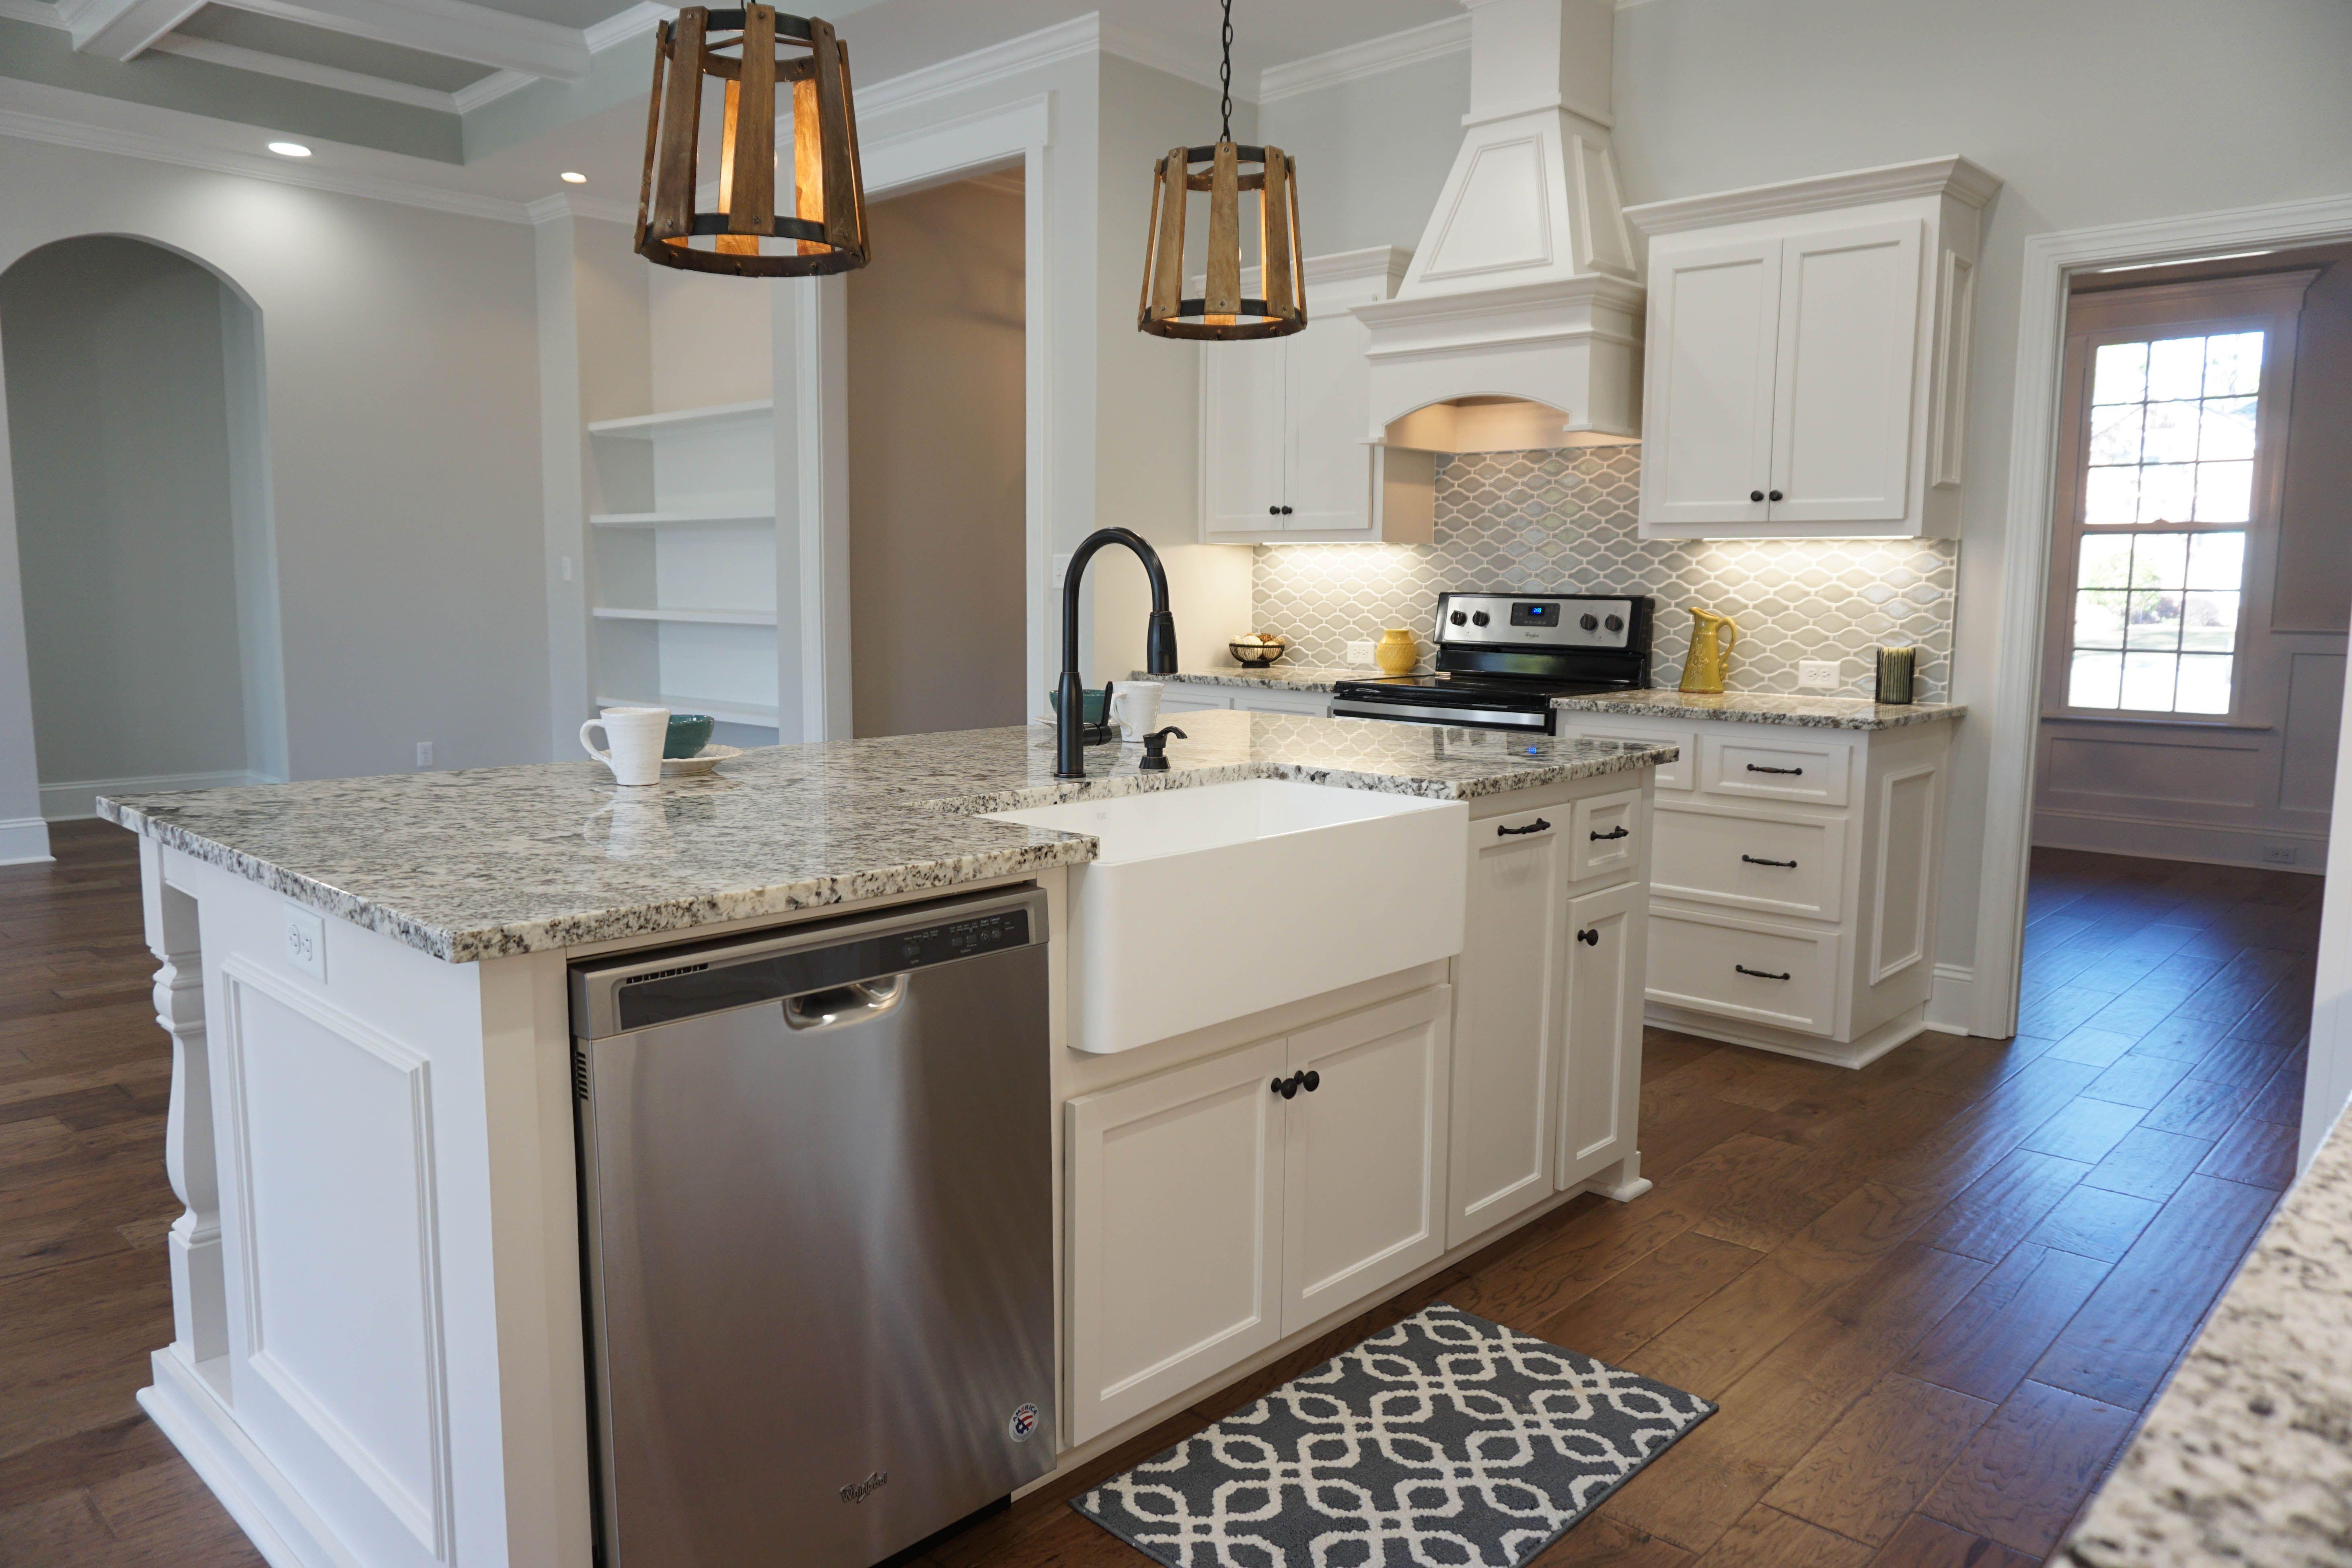 Farmhouse sink and storage galore make this kitchen a